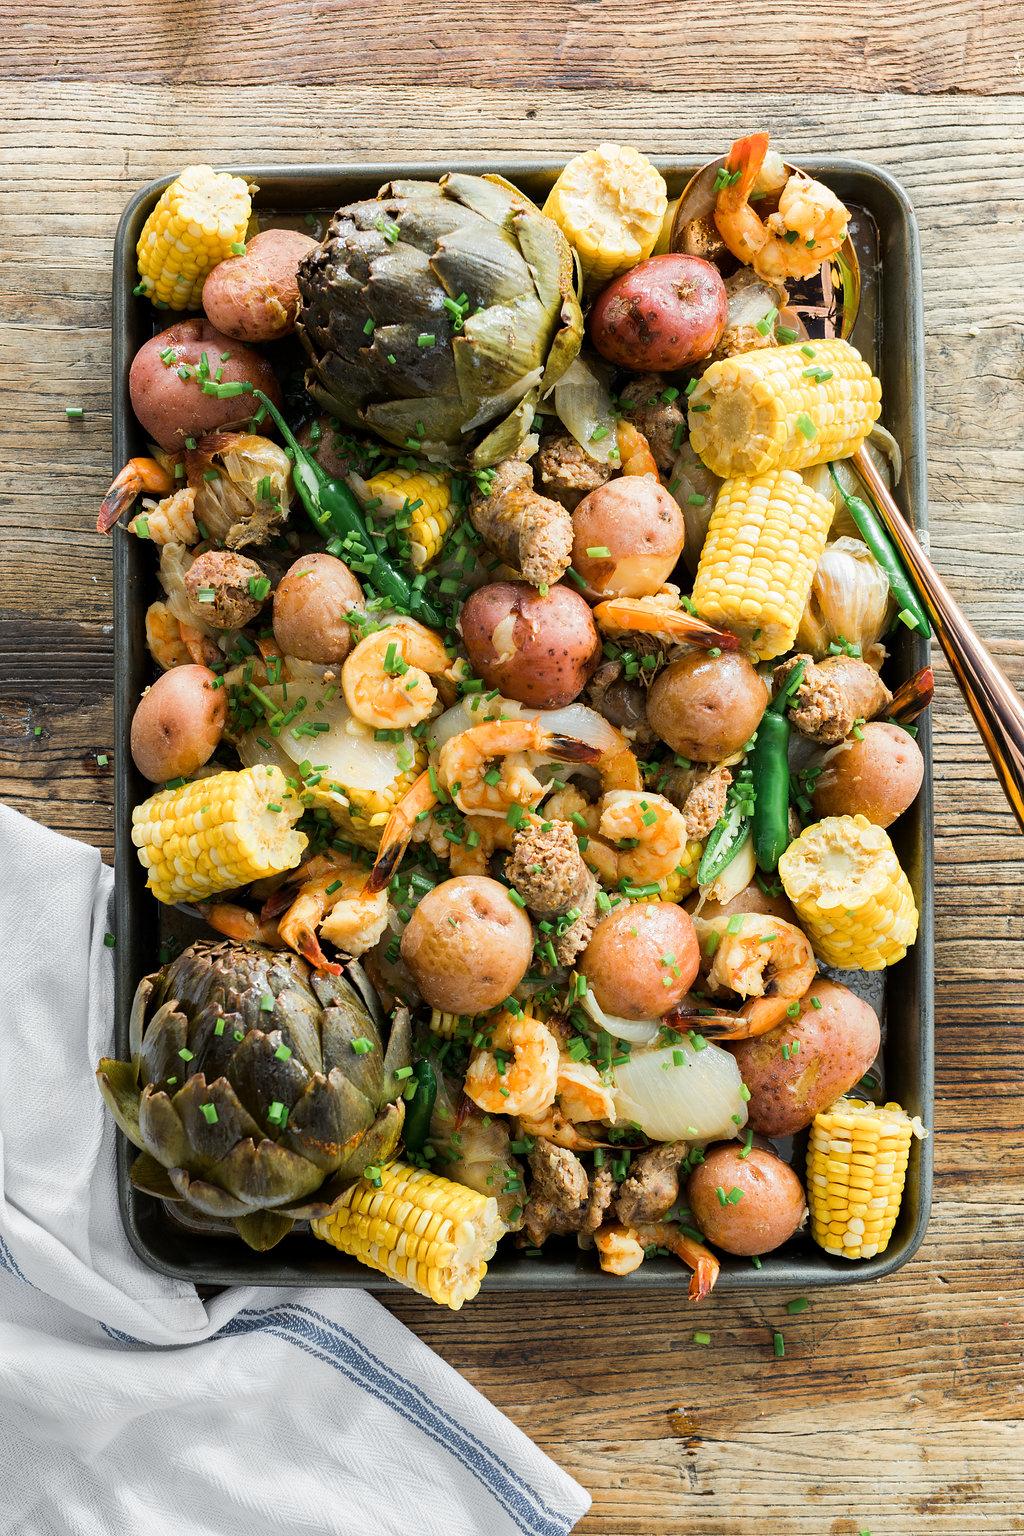 Summer Shrimp Boil recipe on Waiting on Martha